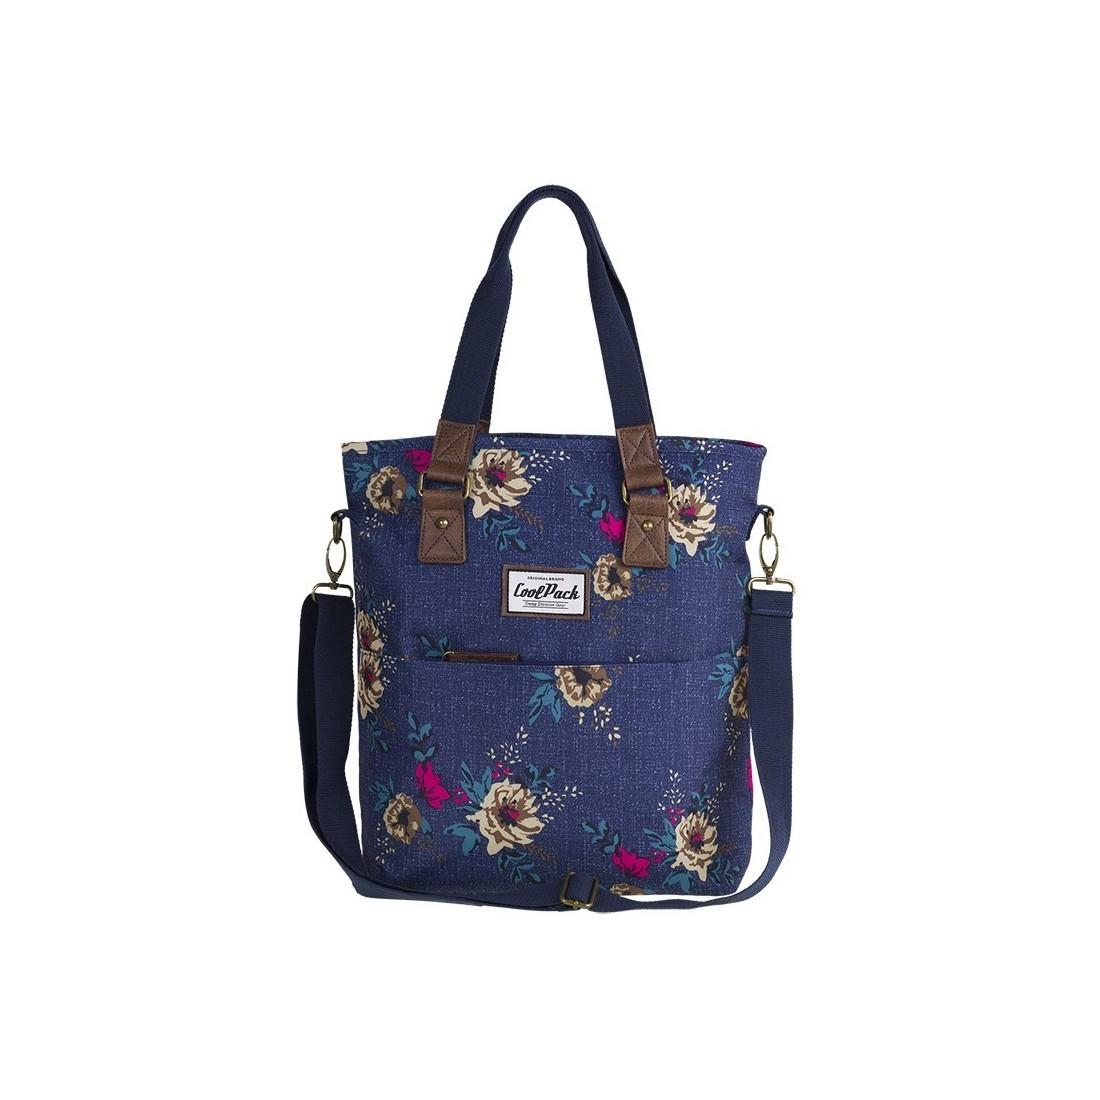 d8b3403162103 Torba damska na ramię CoolPack CP AMBER BLUE DENIM FLOWERS jeans w kolorowe  kwiaty elementy z